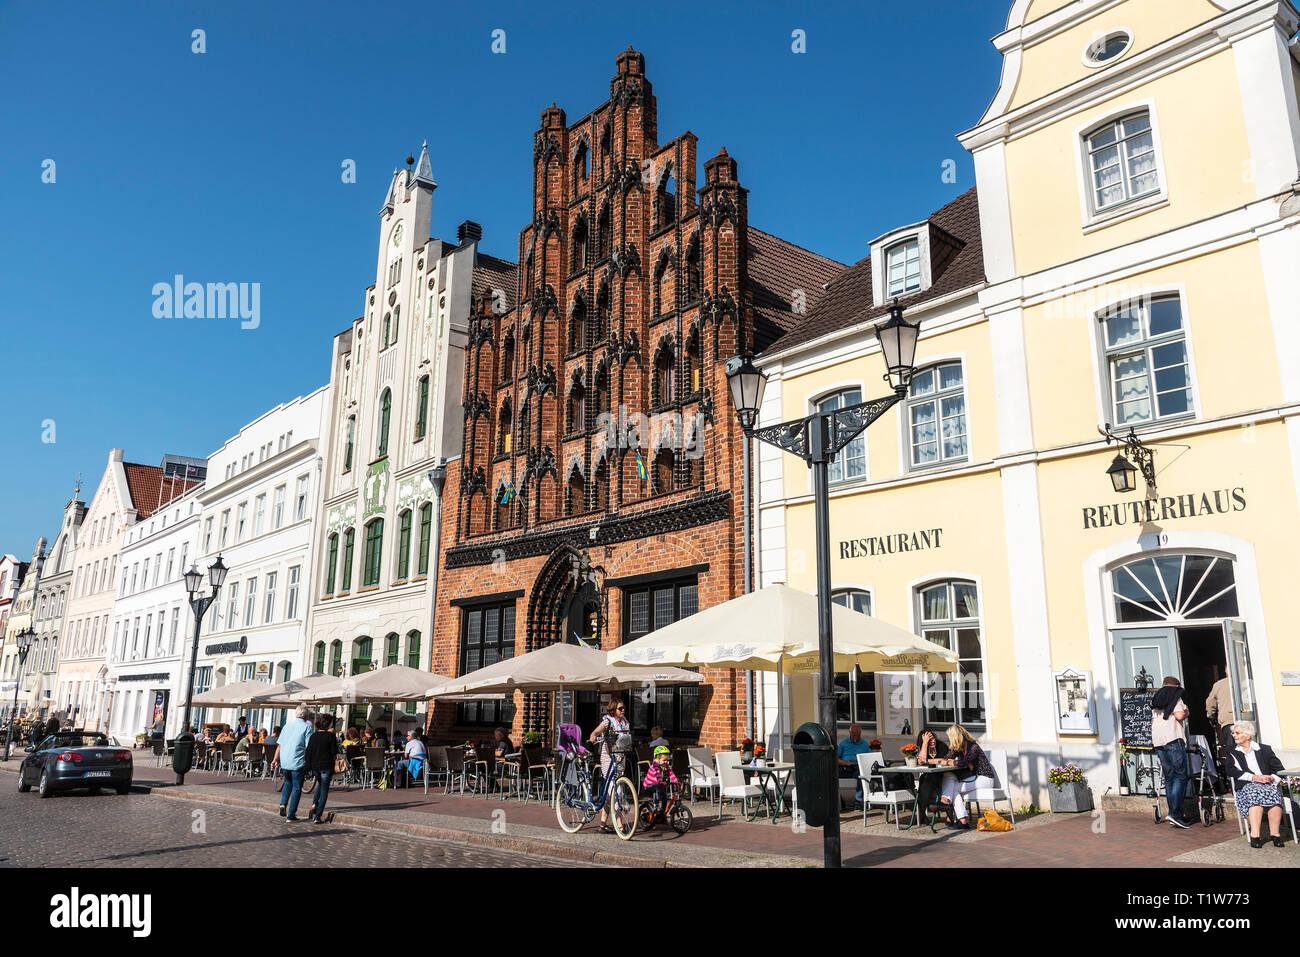 historic gabled houses, restaurant, market place, Wismar, Mecklenburg-Western Pomerania, Germany - Stock Image